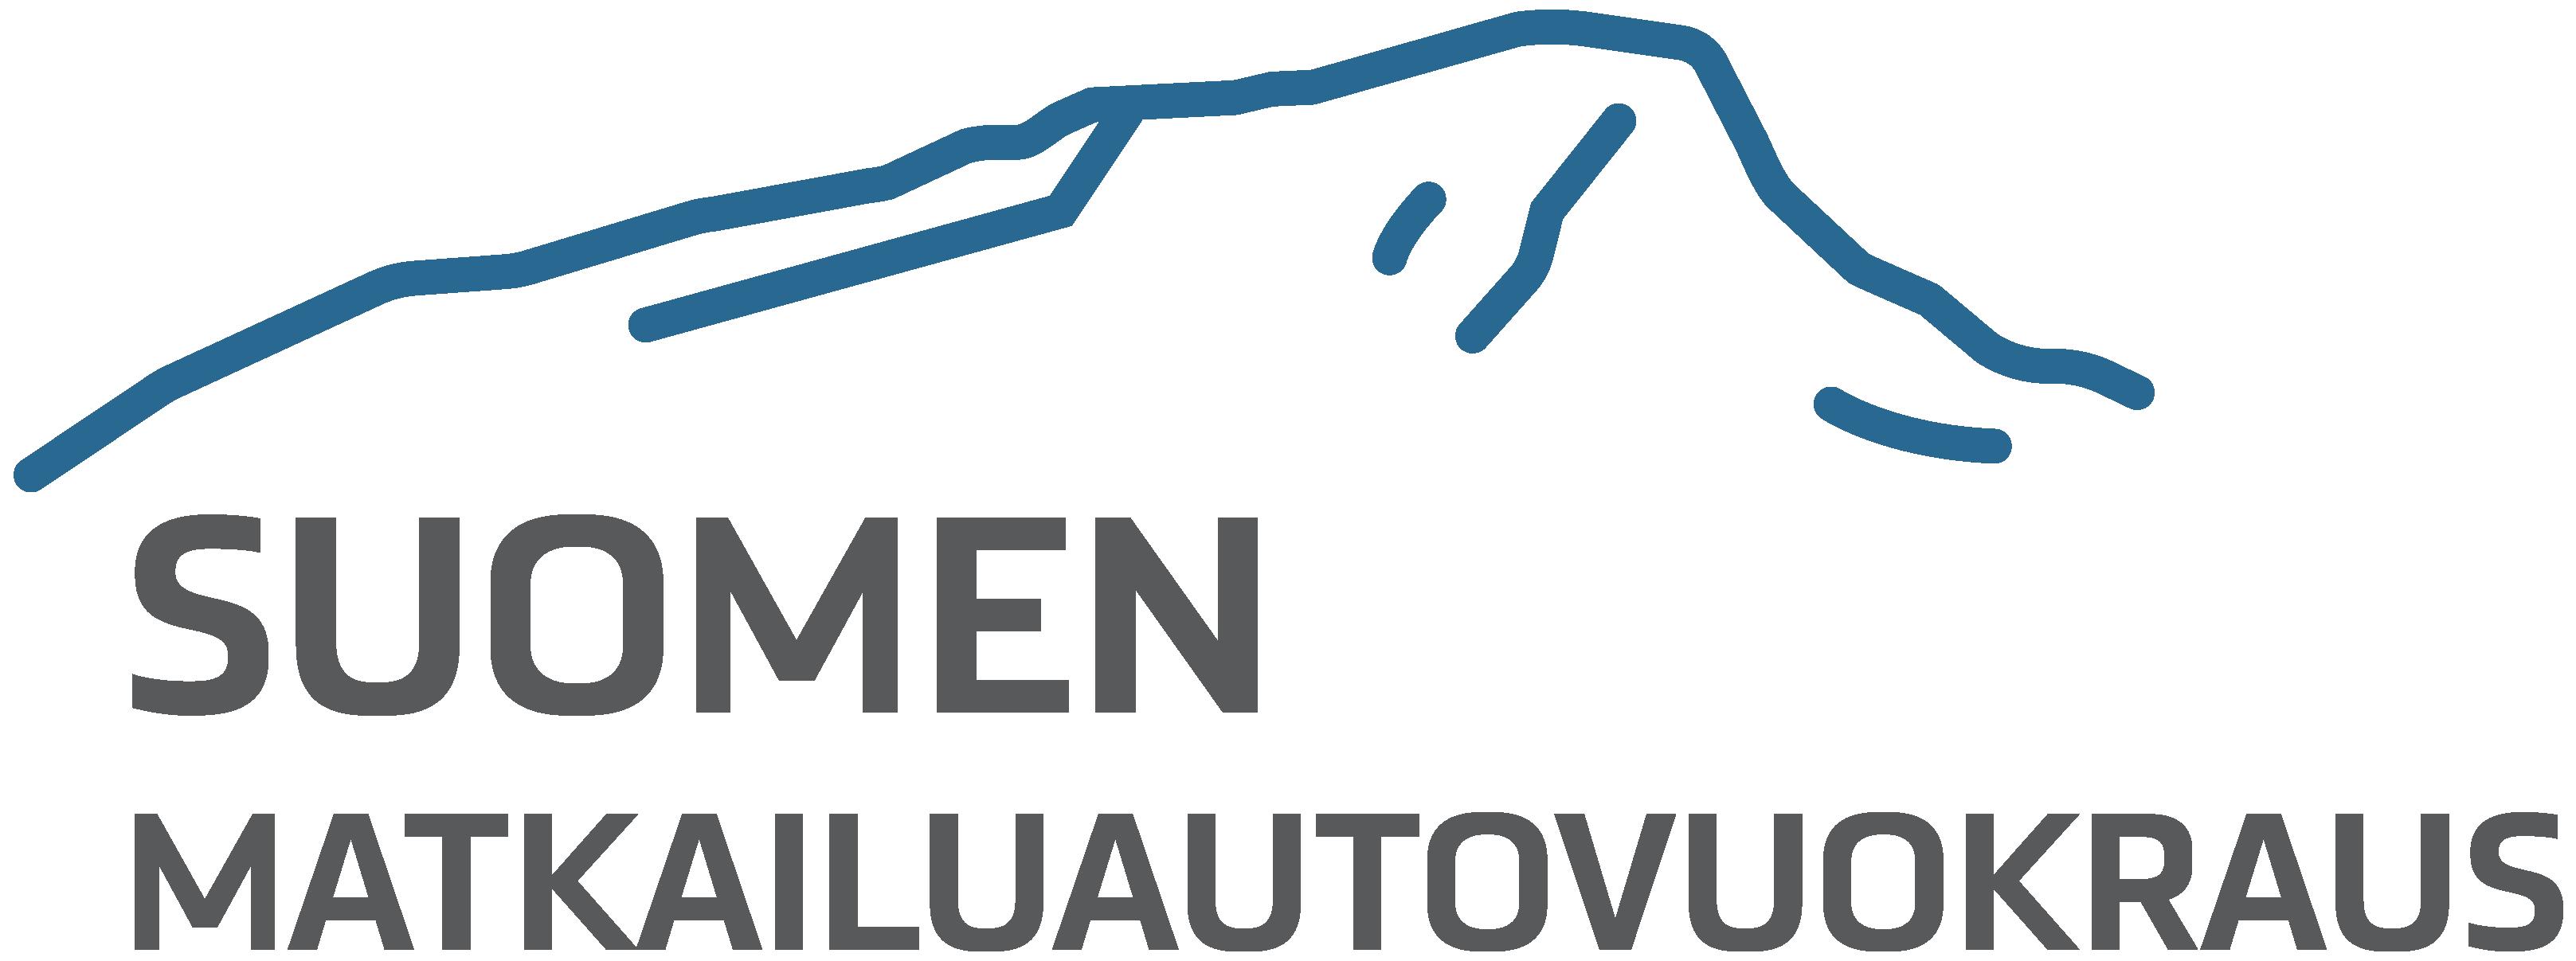 Suomen Matkailuautovuokraus